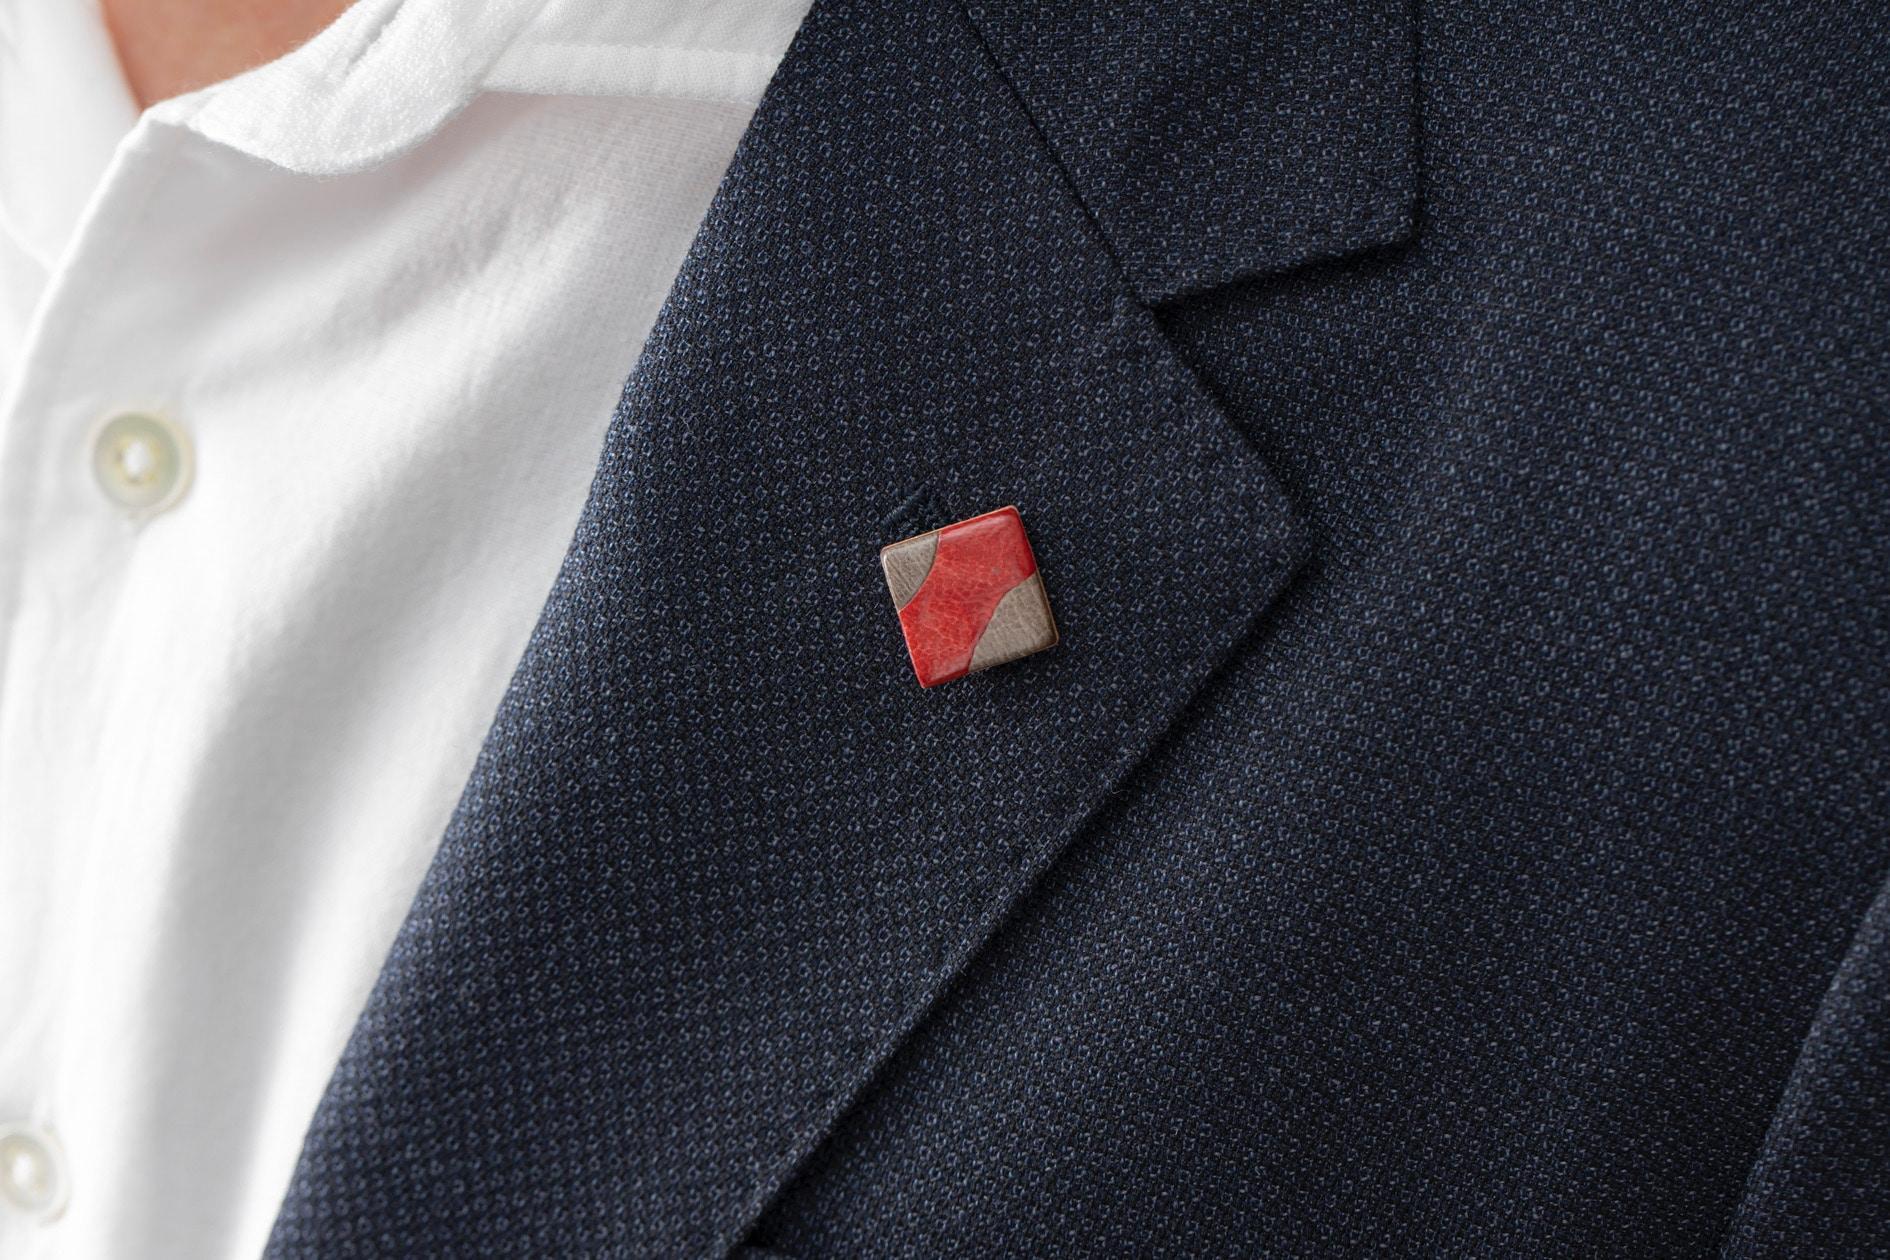 Fu's roomのサフォークレザー「カーブタックピン」を男性ジャケットに着ける,ハンドメイドアクセサリー